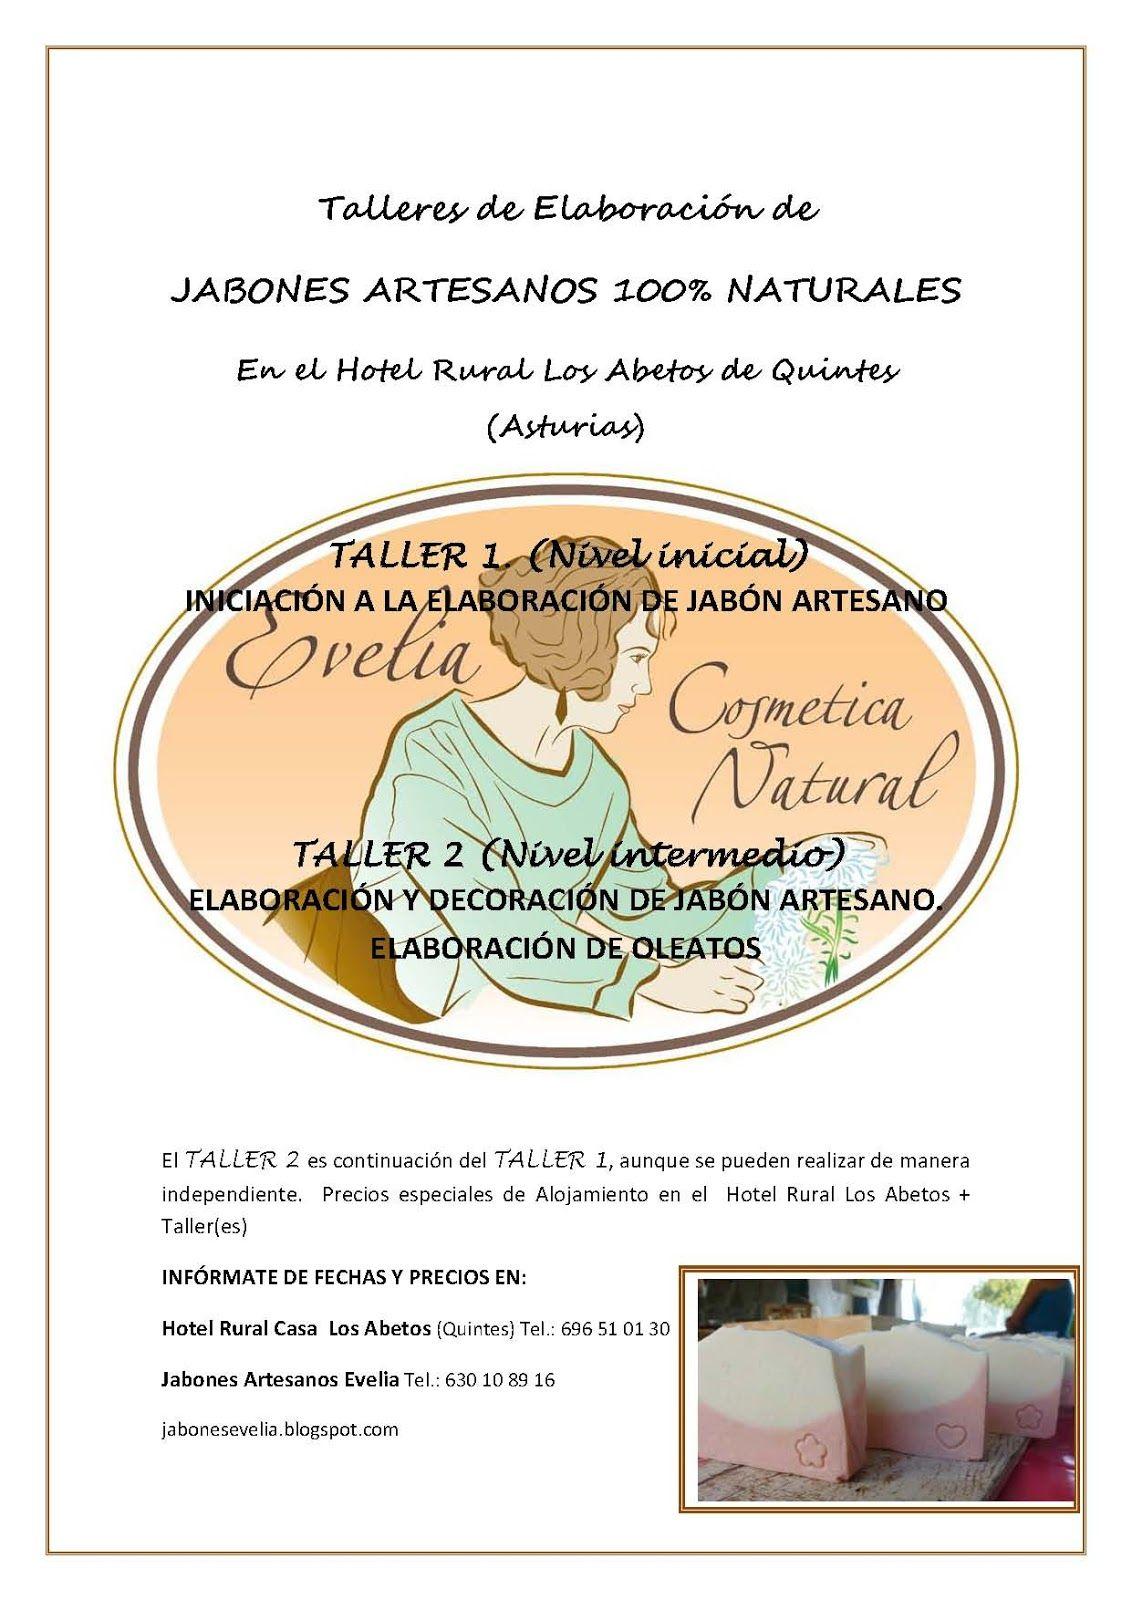 Talleres De Jabon Artesano En Asturias Cosmetica Natural